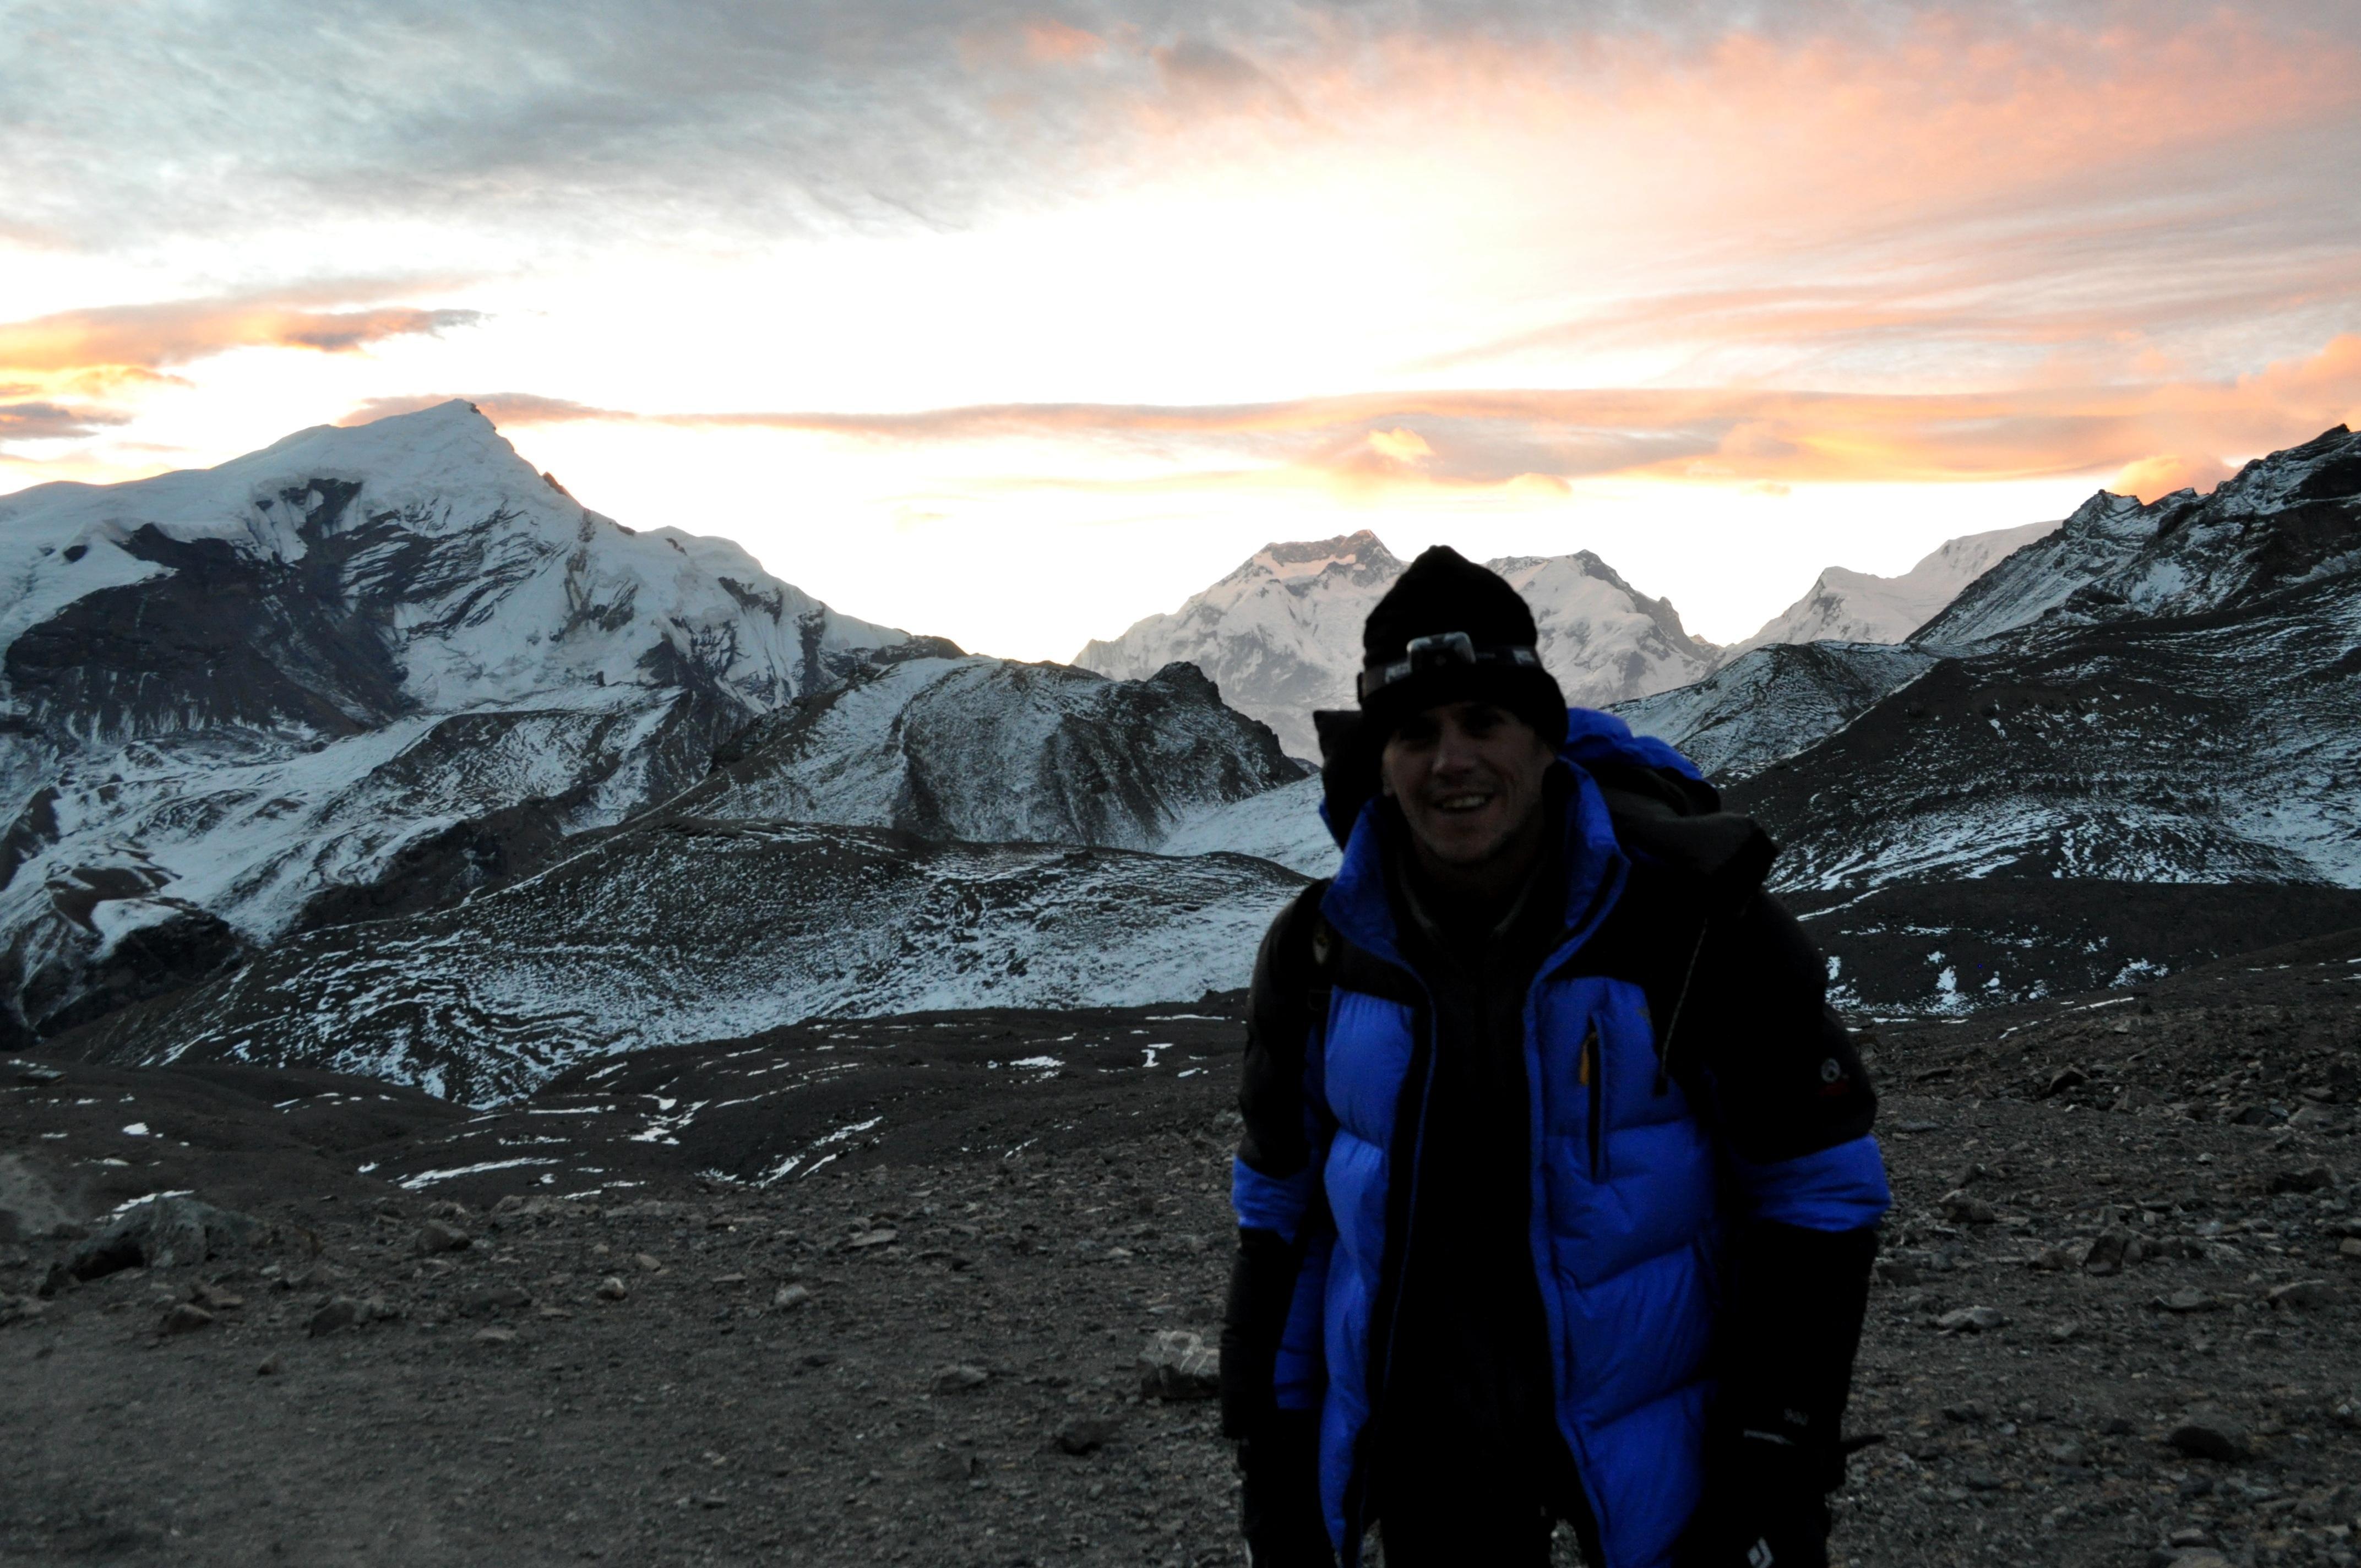 Gabriele e la sua alba Himalayana